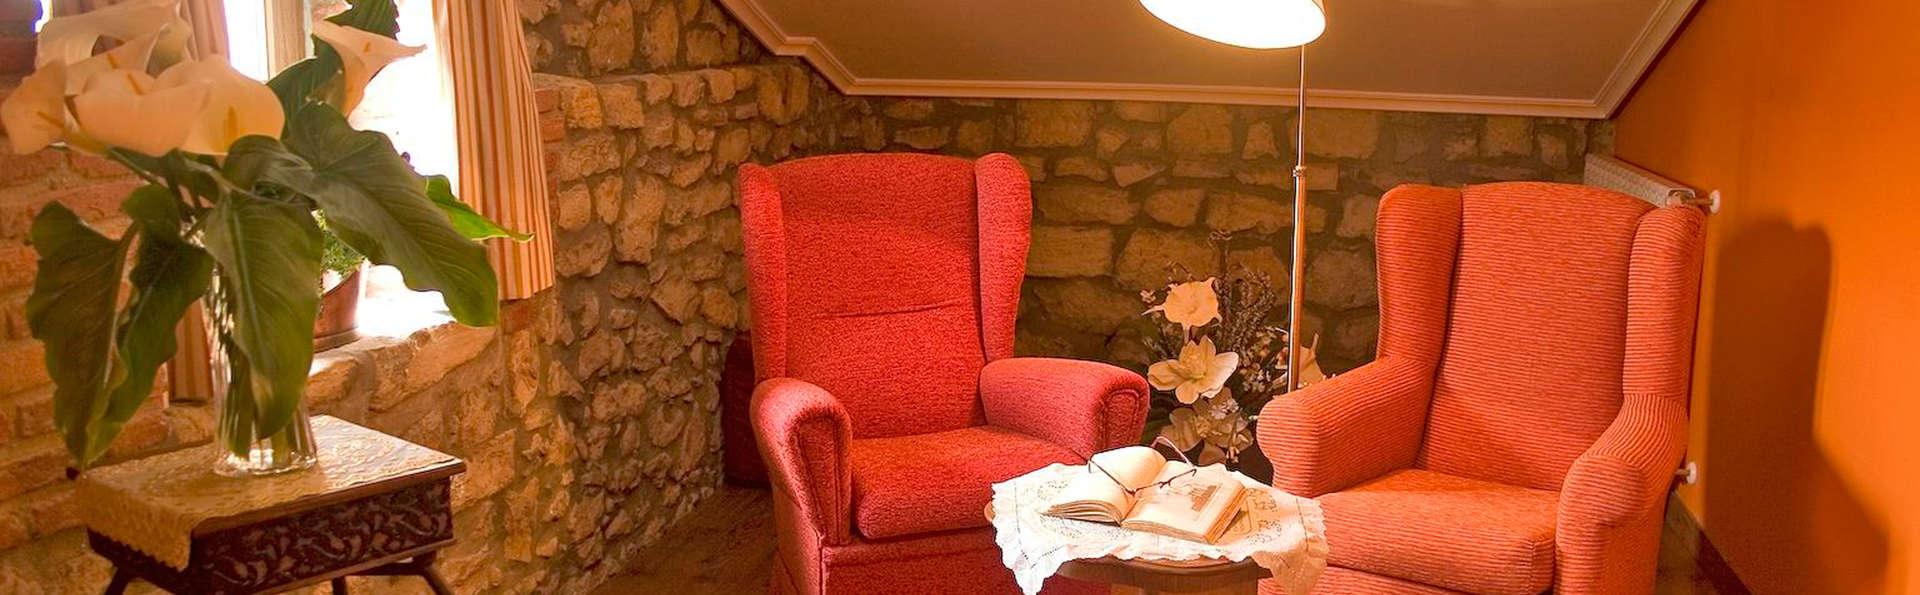 Hotel Casona los Caballeros - EDIT_room5.jpg